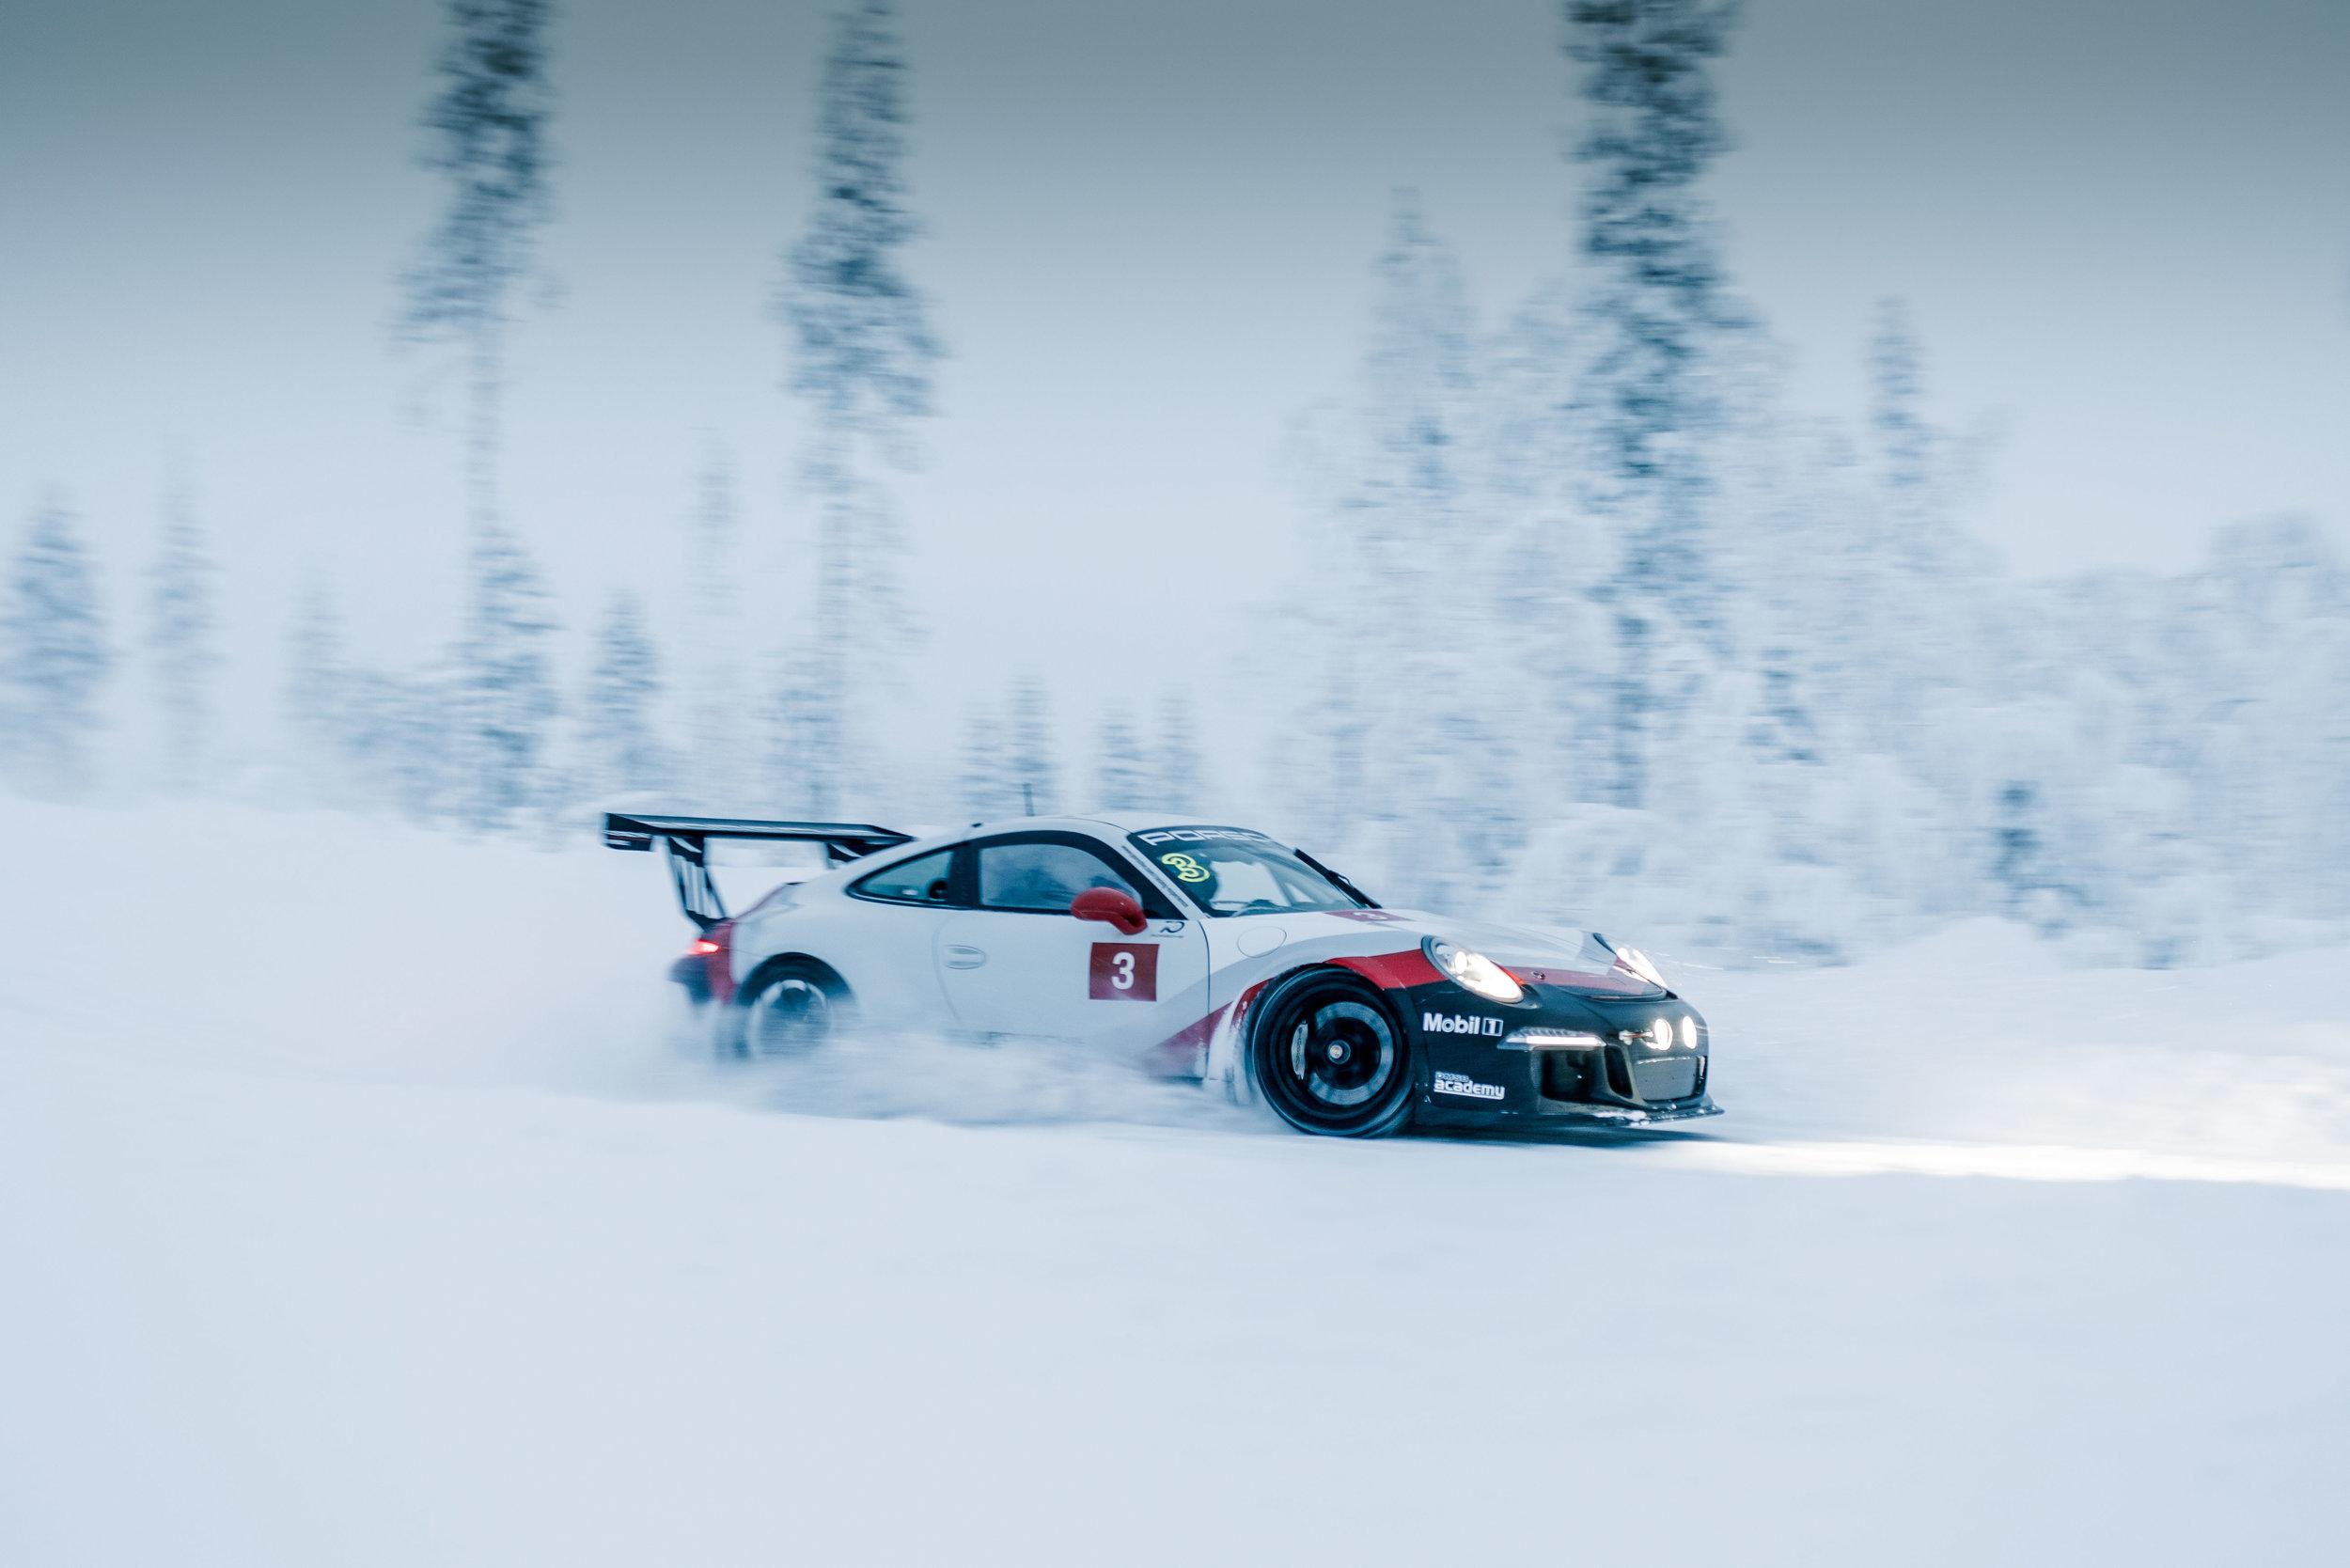 Porsche Ice Experience on Ice_30_01_2019_0243_175645.jpg